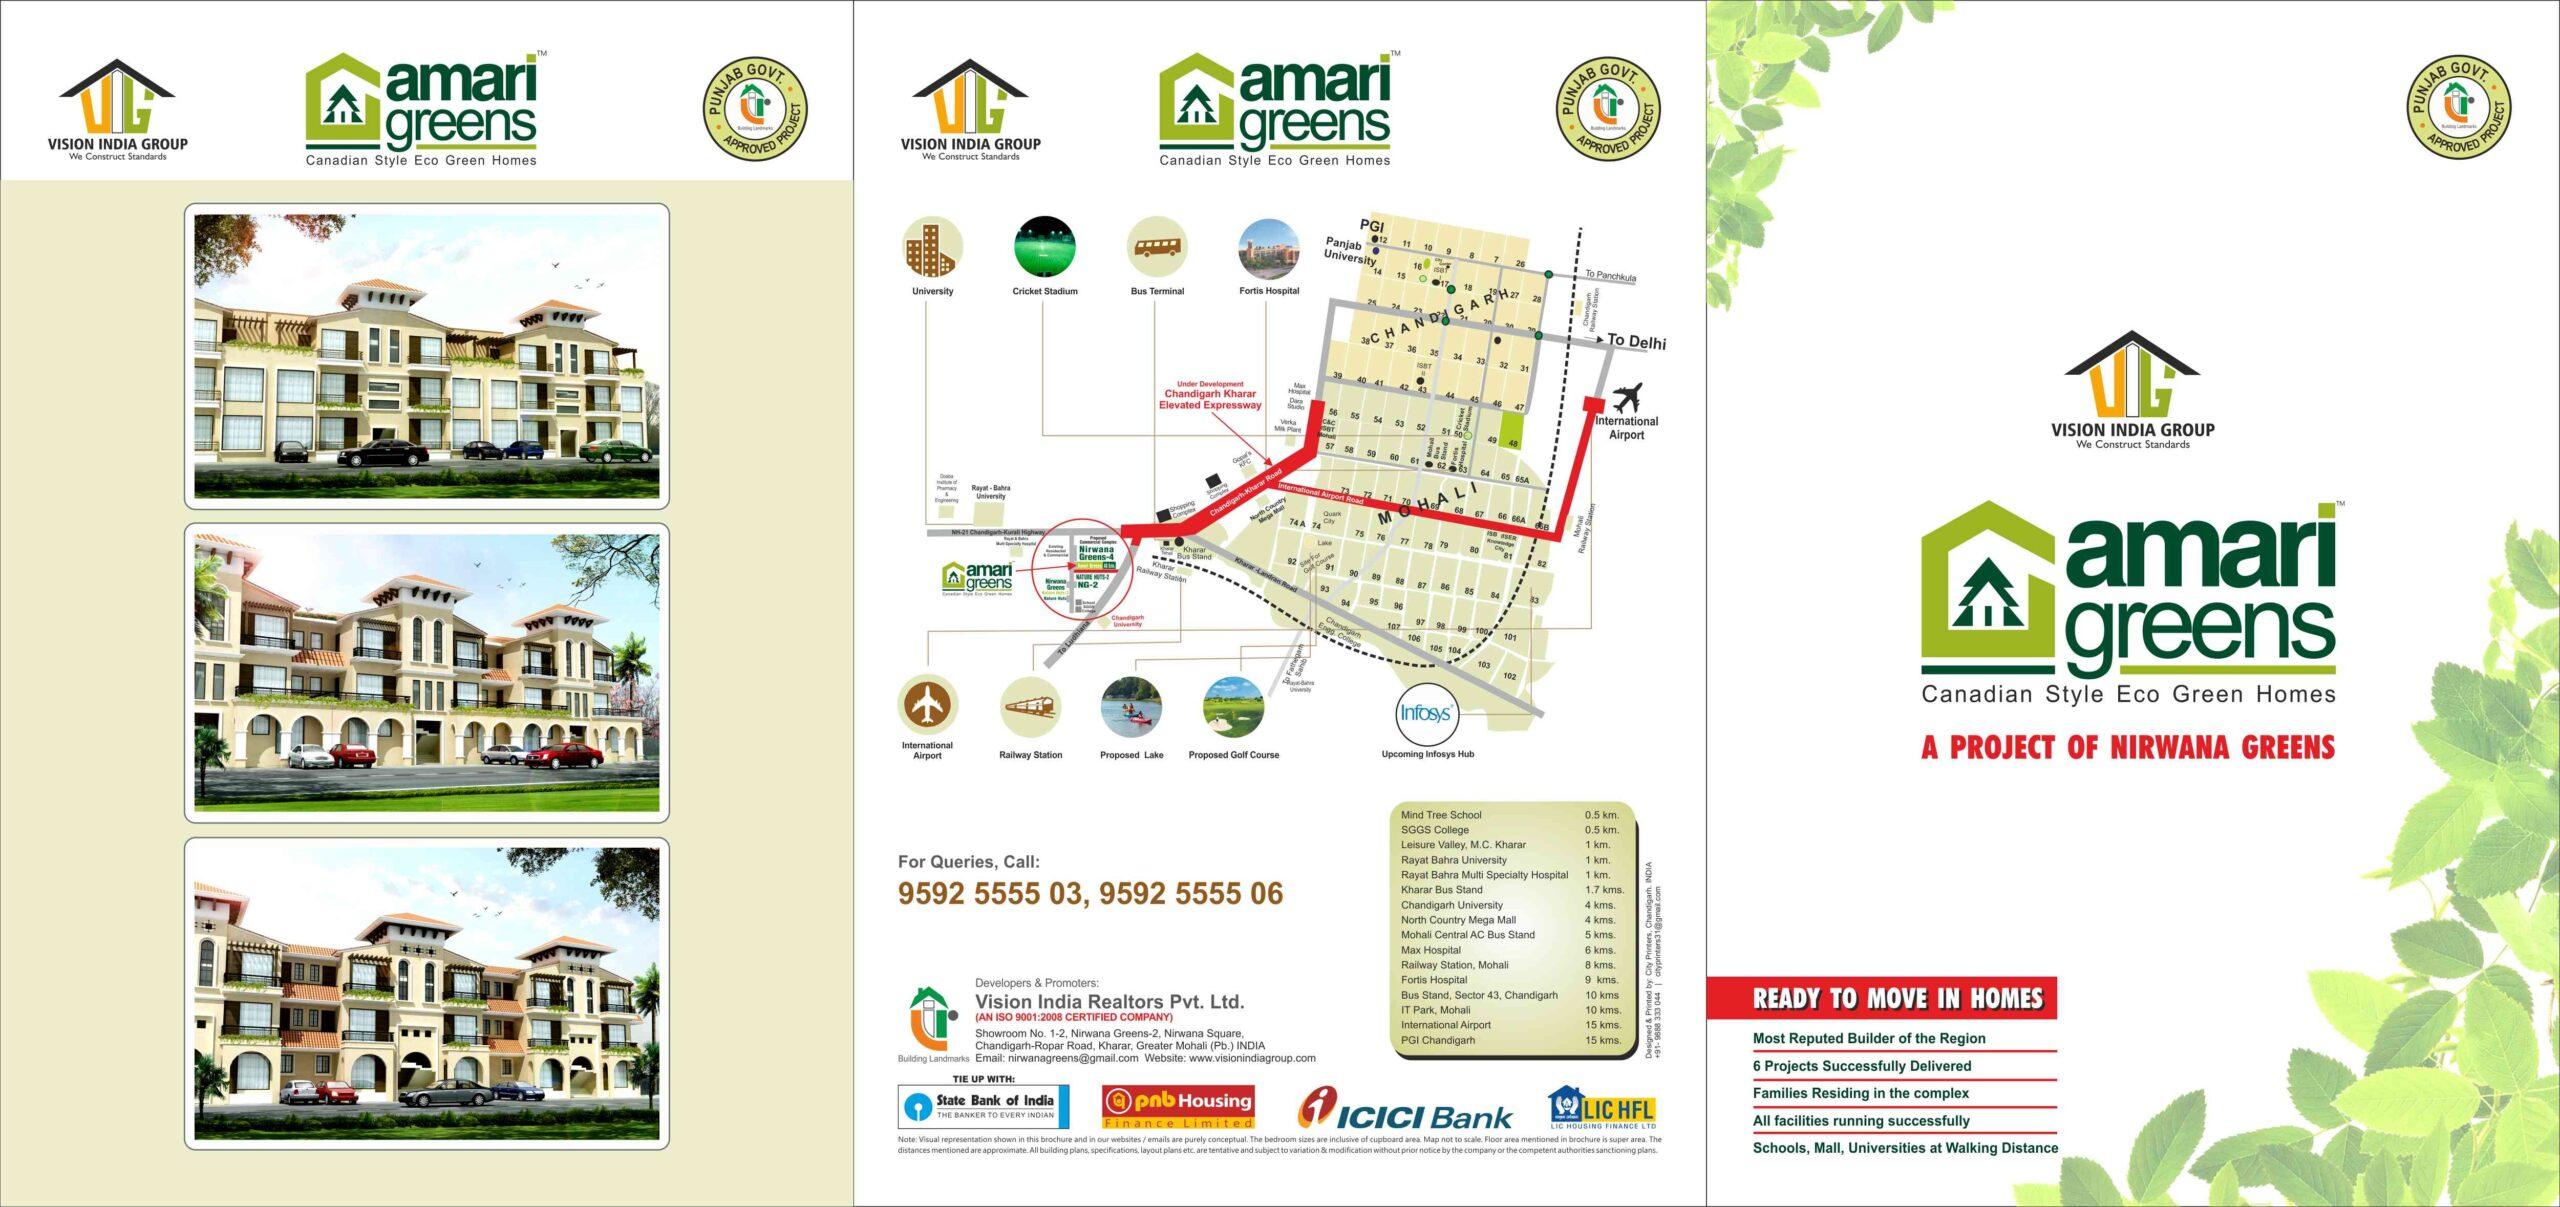 Amari-Greens-Brochure-Outer-3